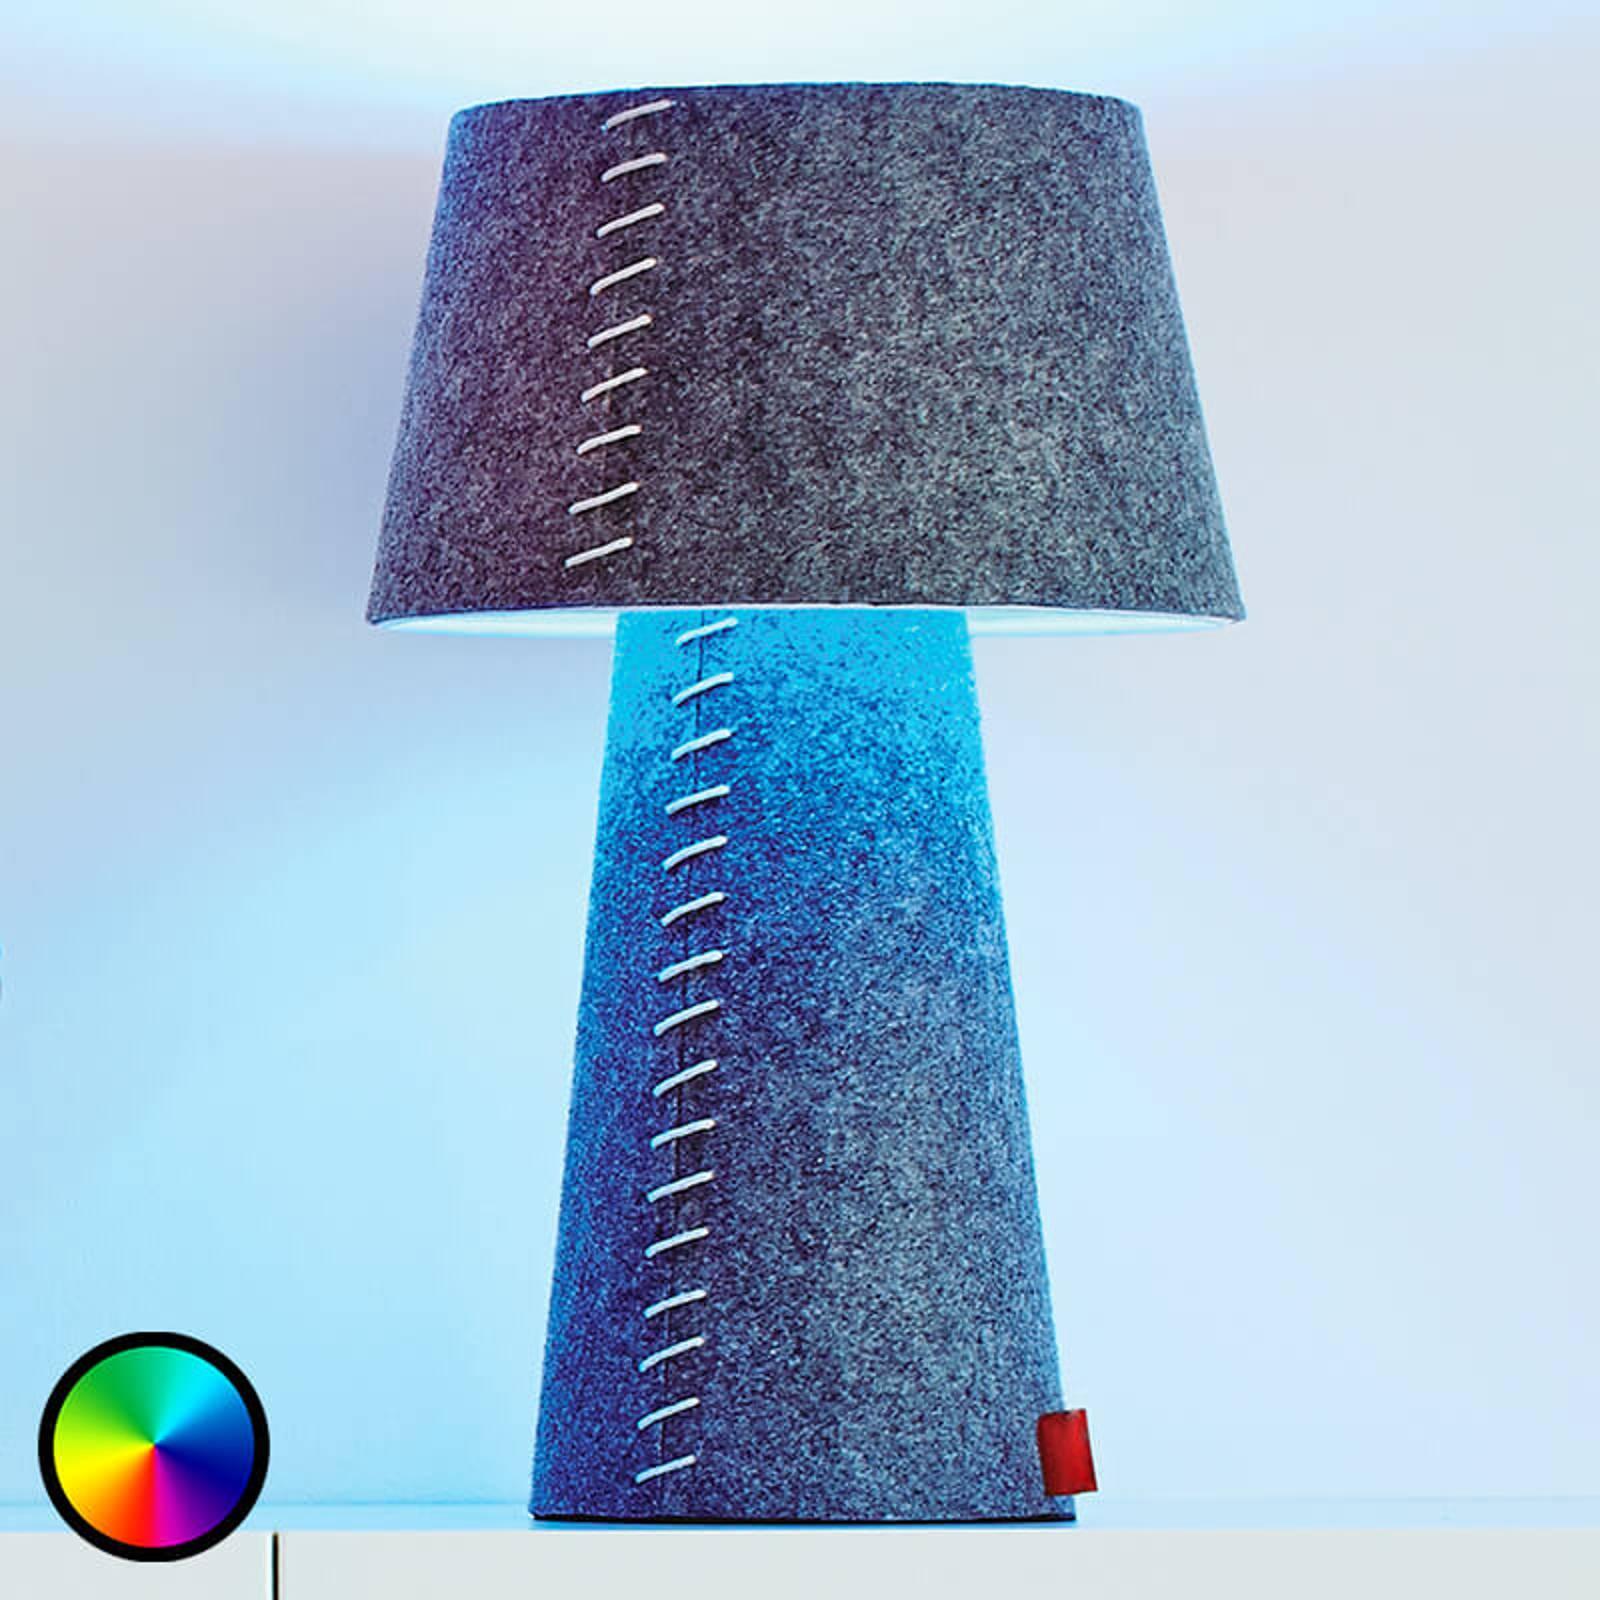 Kleurwisselende LED tafellamp Alice van vilt